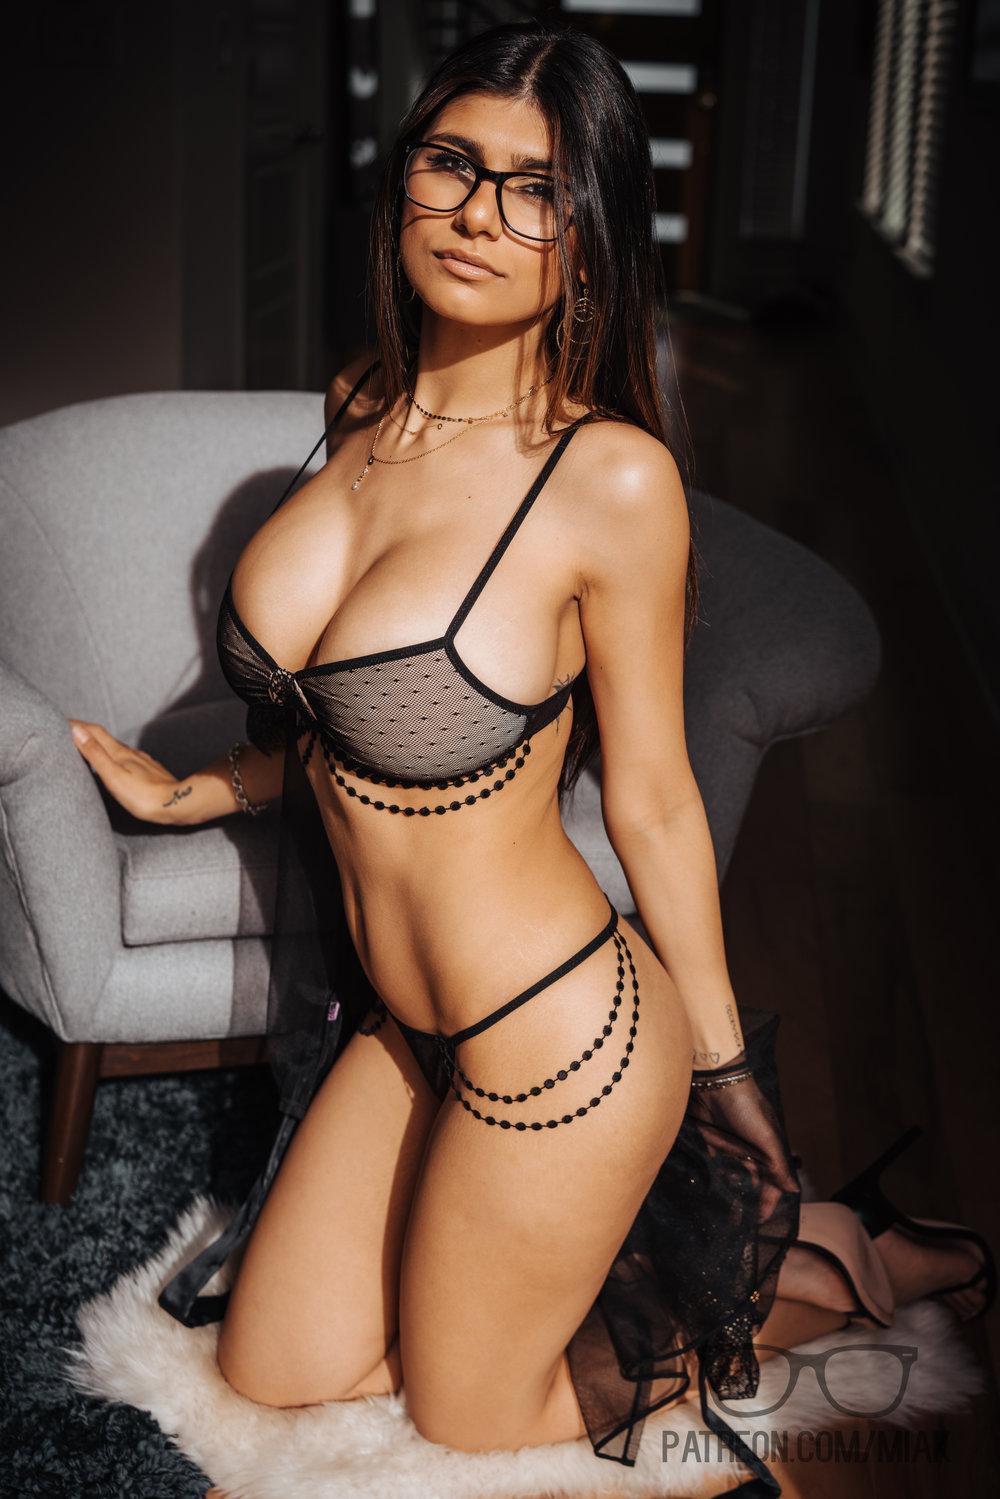 Mia Khalifa Lingerie Stiletto Heels Photoshoot Leaked 0014